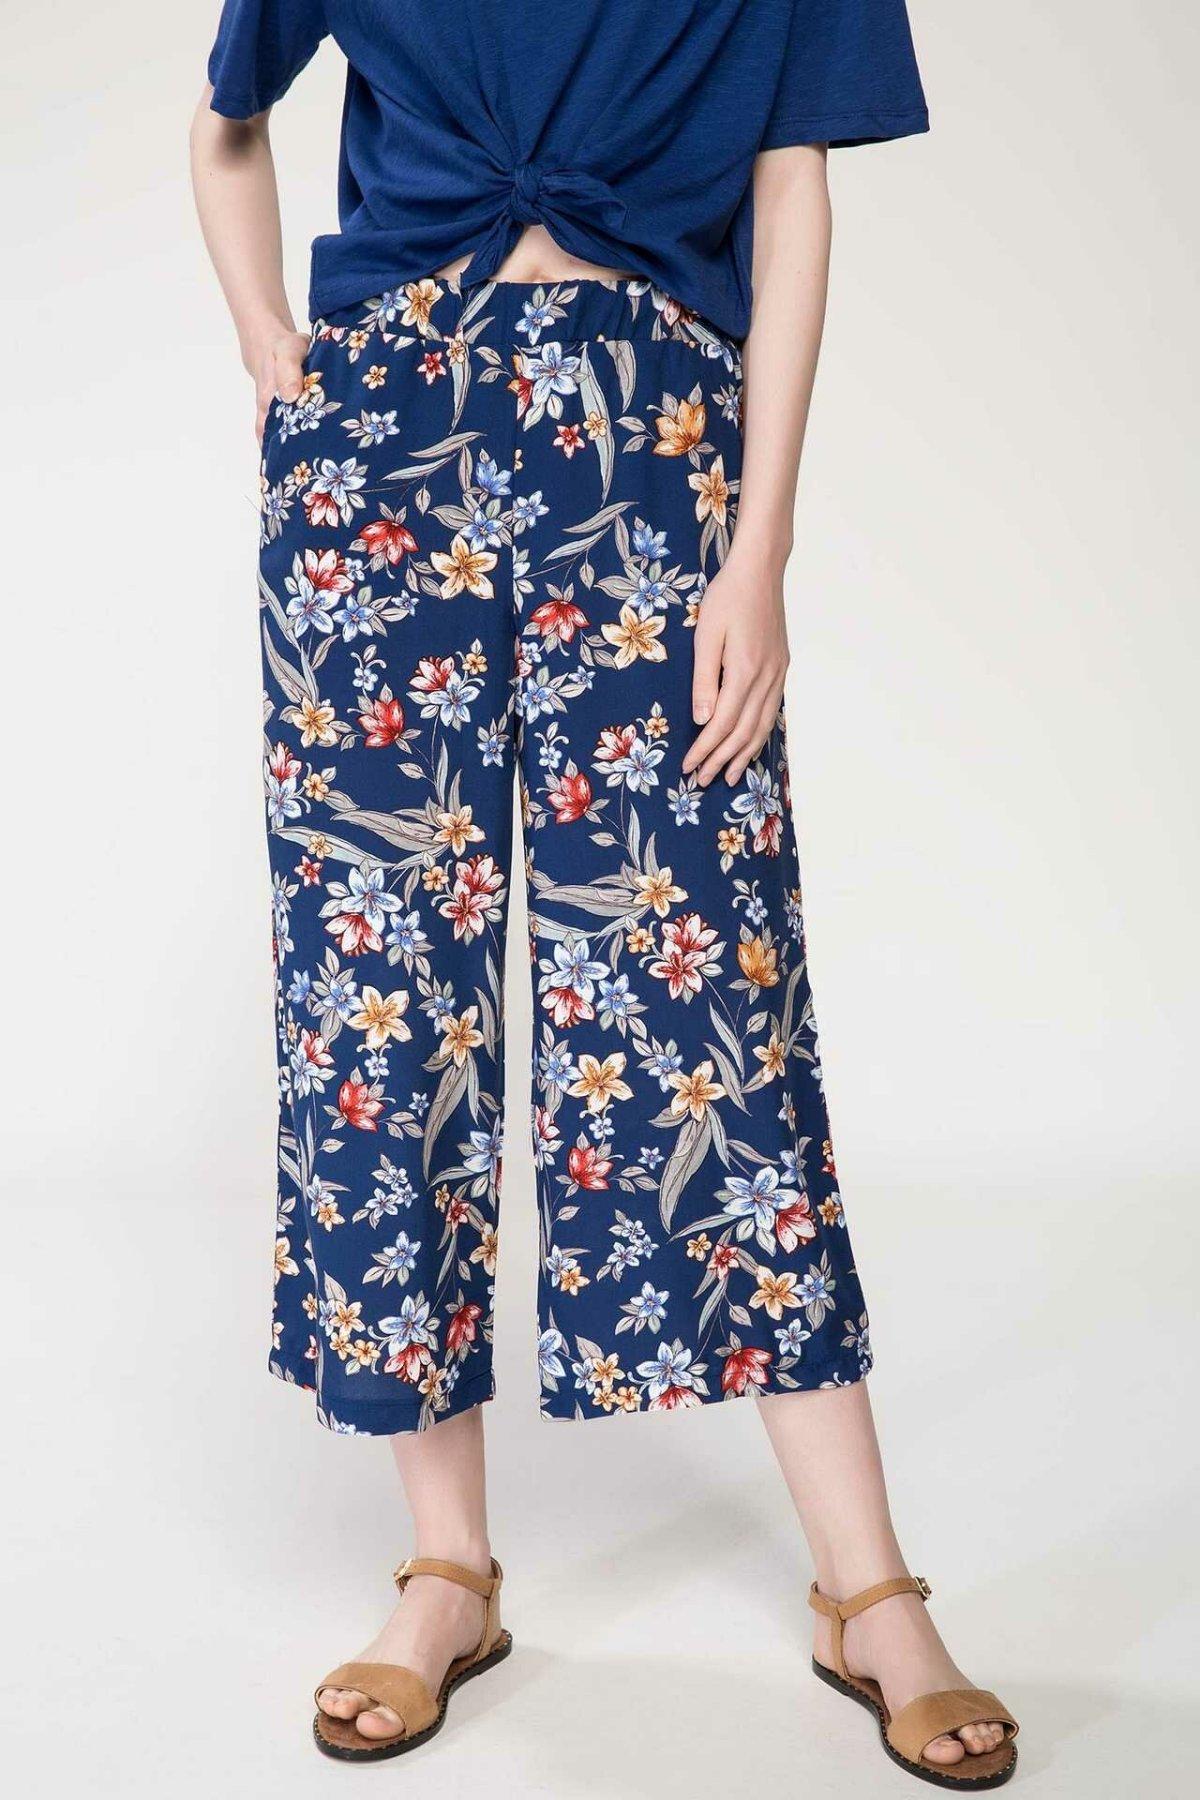 DeFacto Summer Casual Prints Wide Leg Pants Women Loose Floral Striped Bottoms Women Elastic Ninth Trousers-I3771AZ18SM